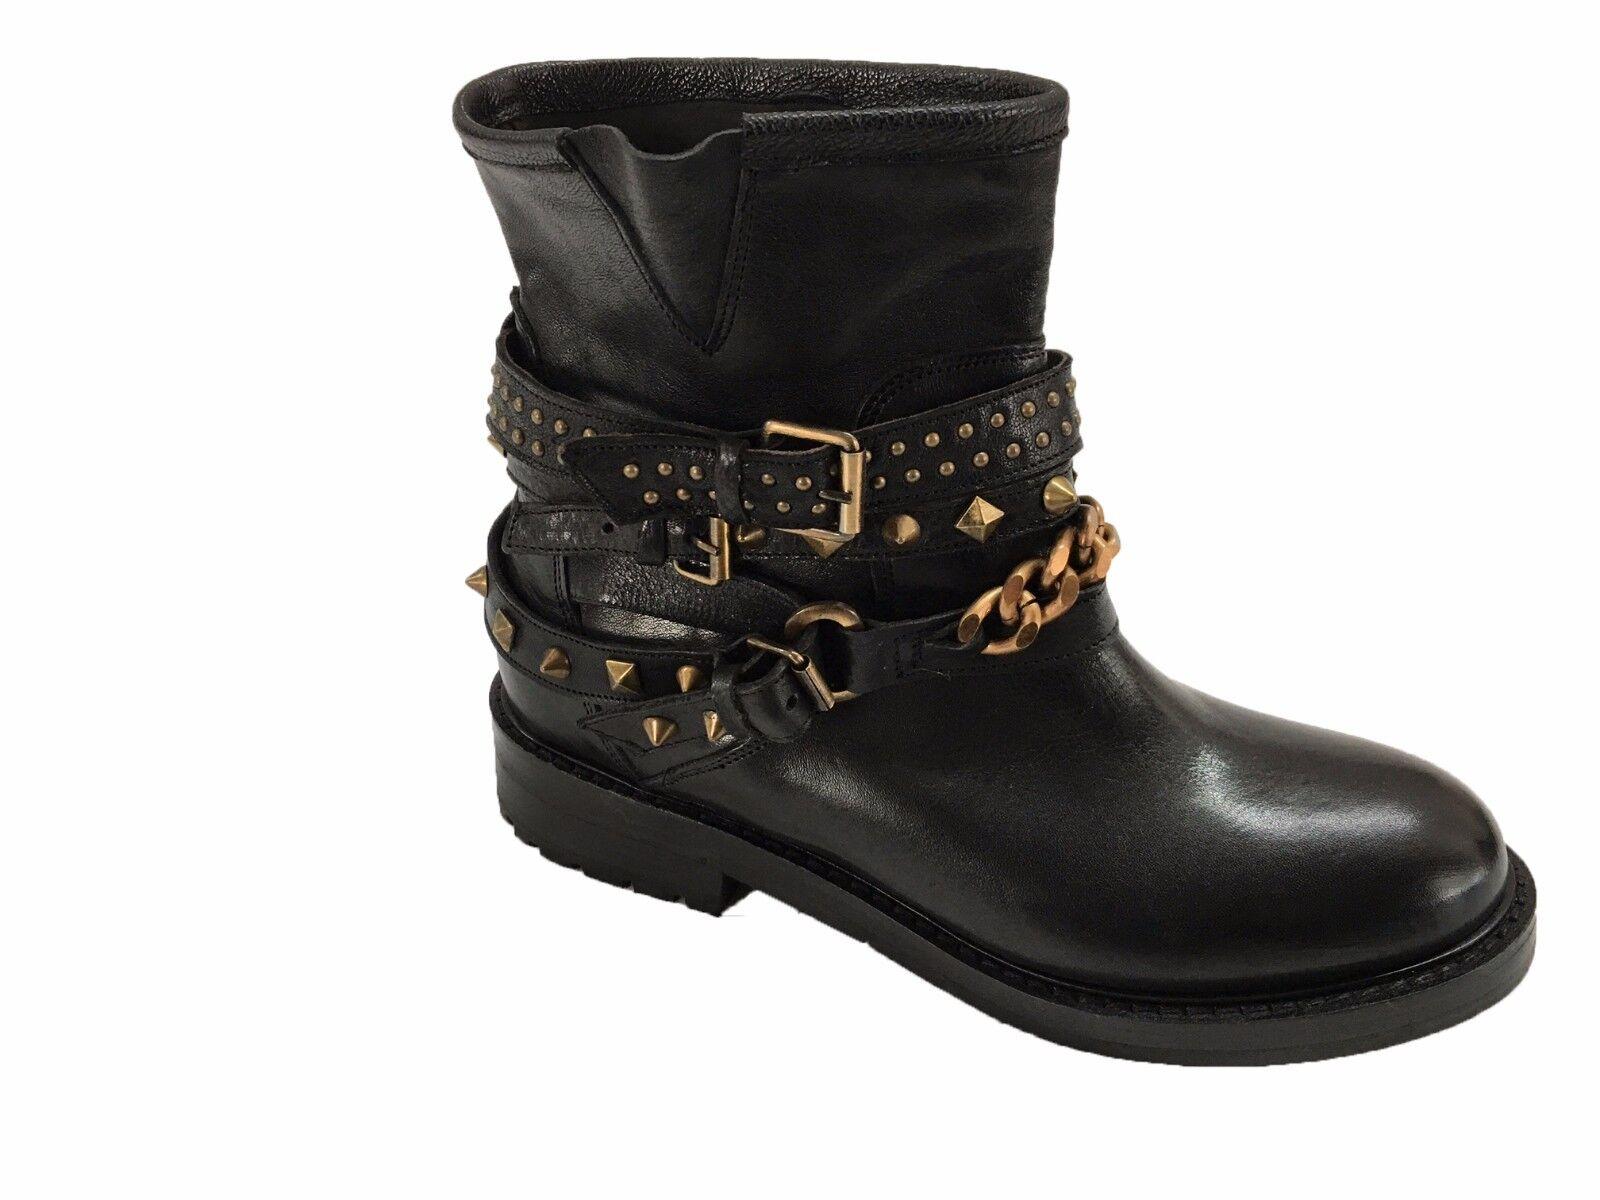 LE RUEMARCEL low boots woman studded rubber sole heel cm 3 SIZE 40